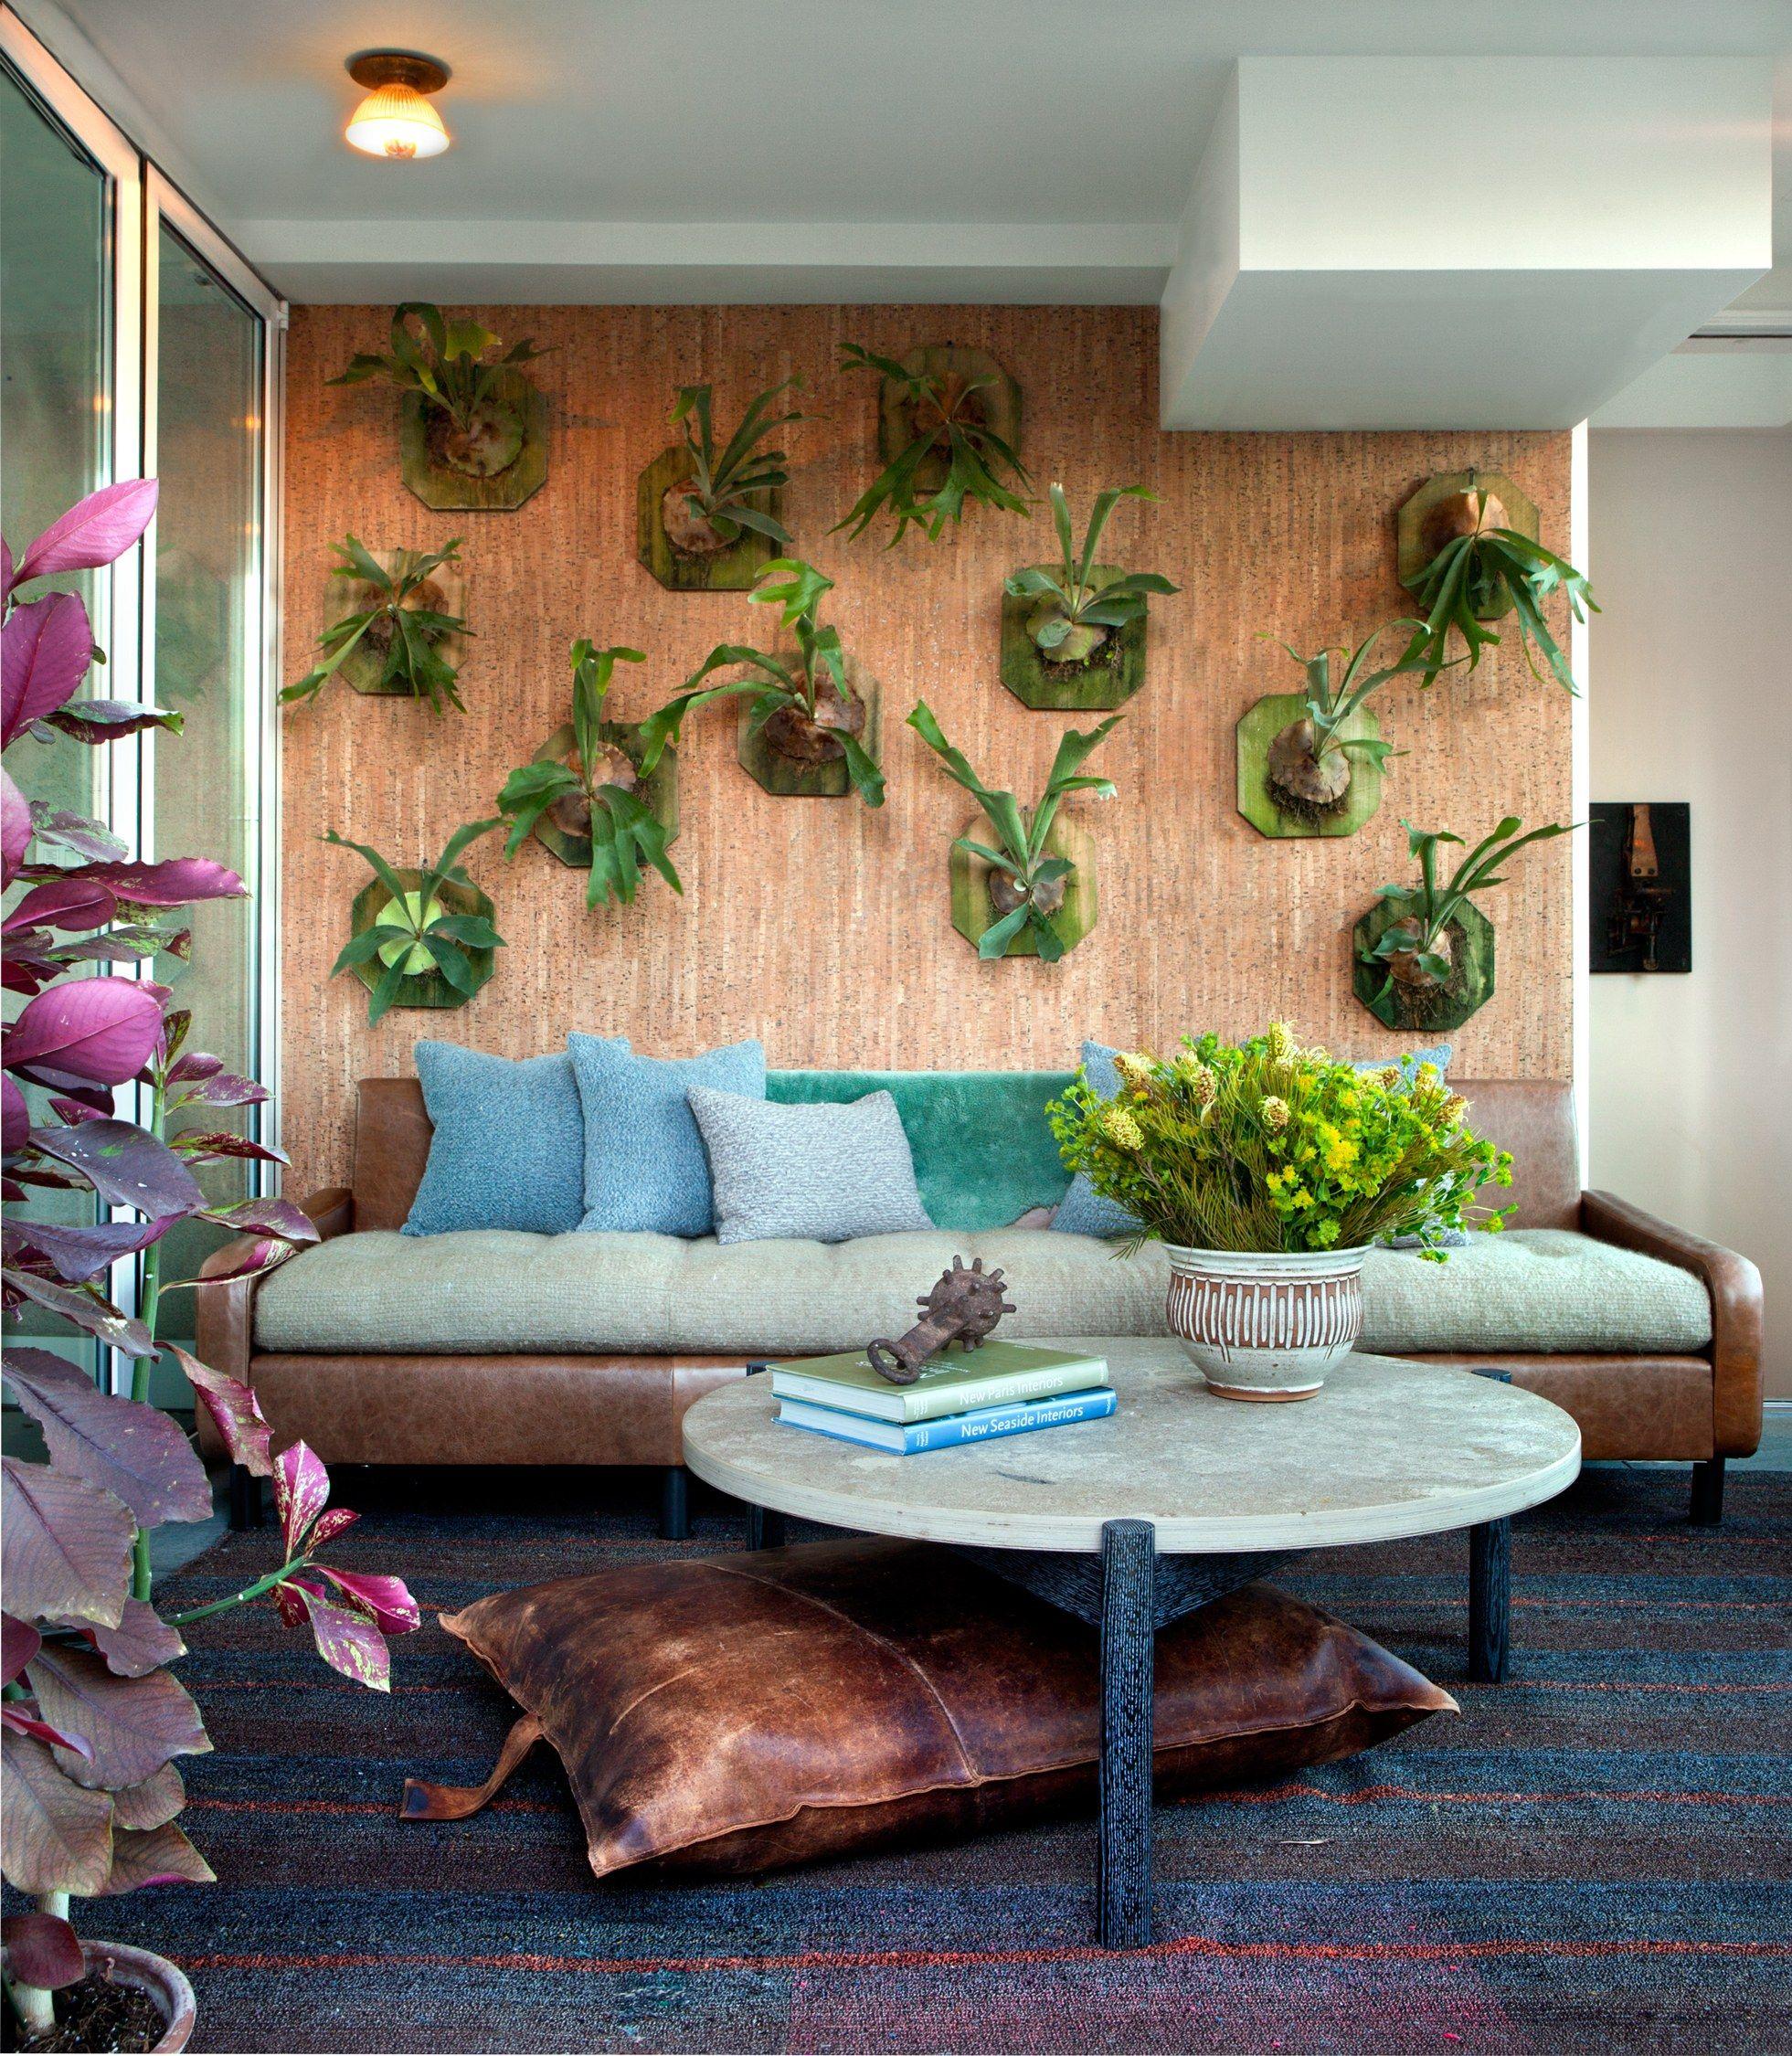 Manhattan New York Studio Apartments: A Healthy-Living Retreat In New York City Where Wellness